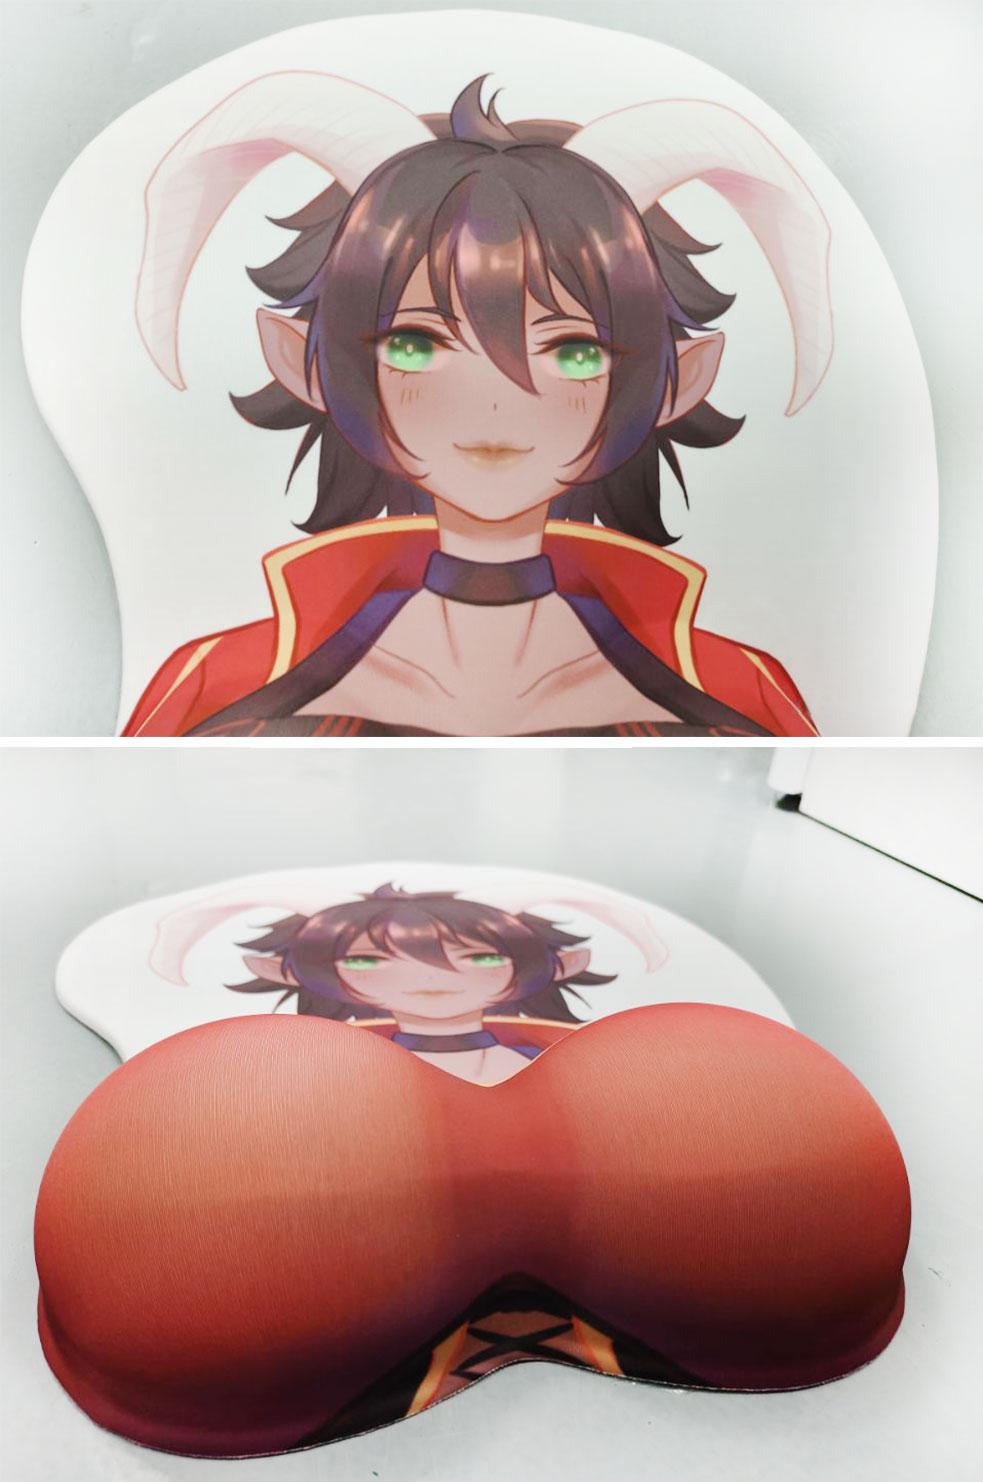 miku nakano life size oppai mousepad 3882 - Anime Mousepads